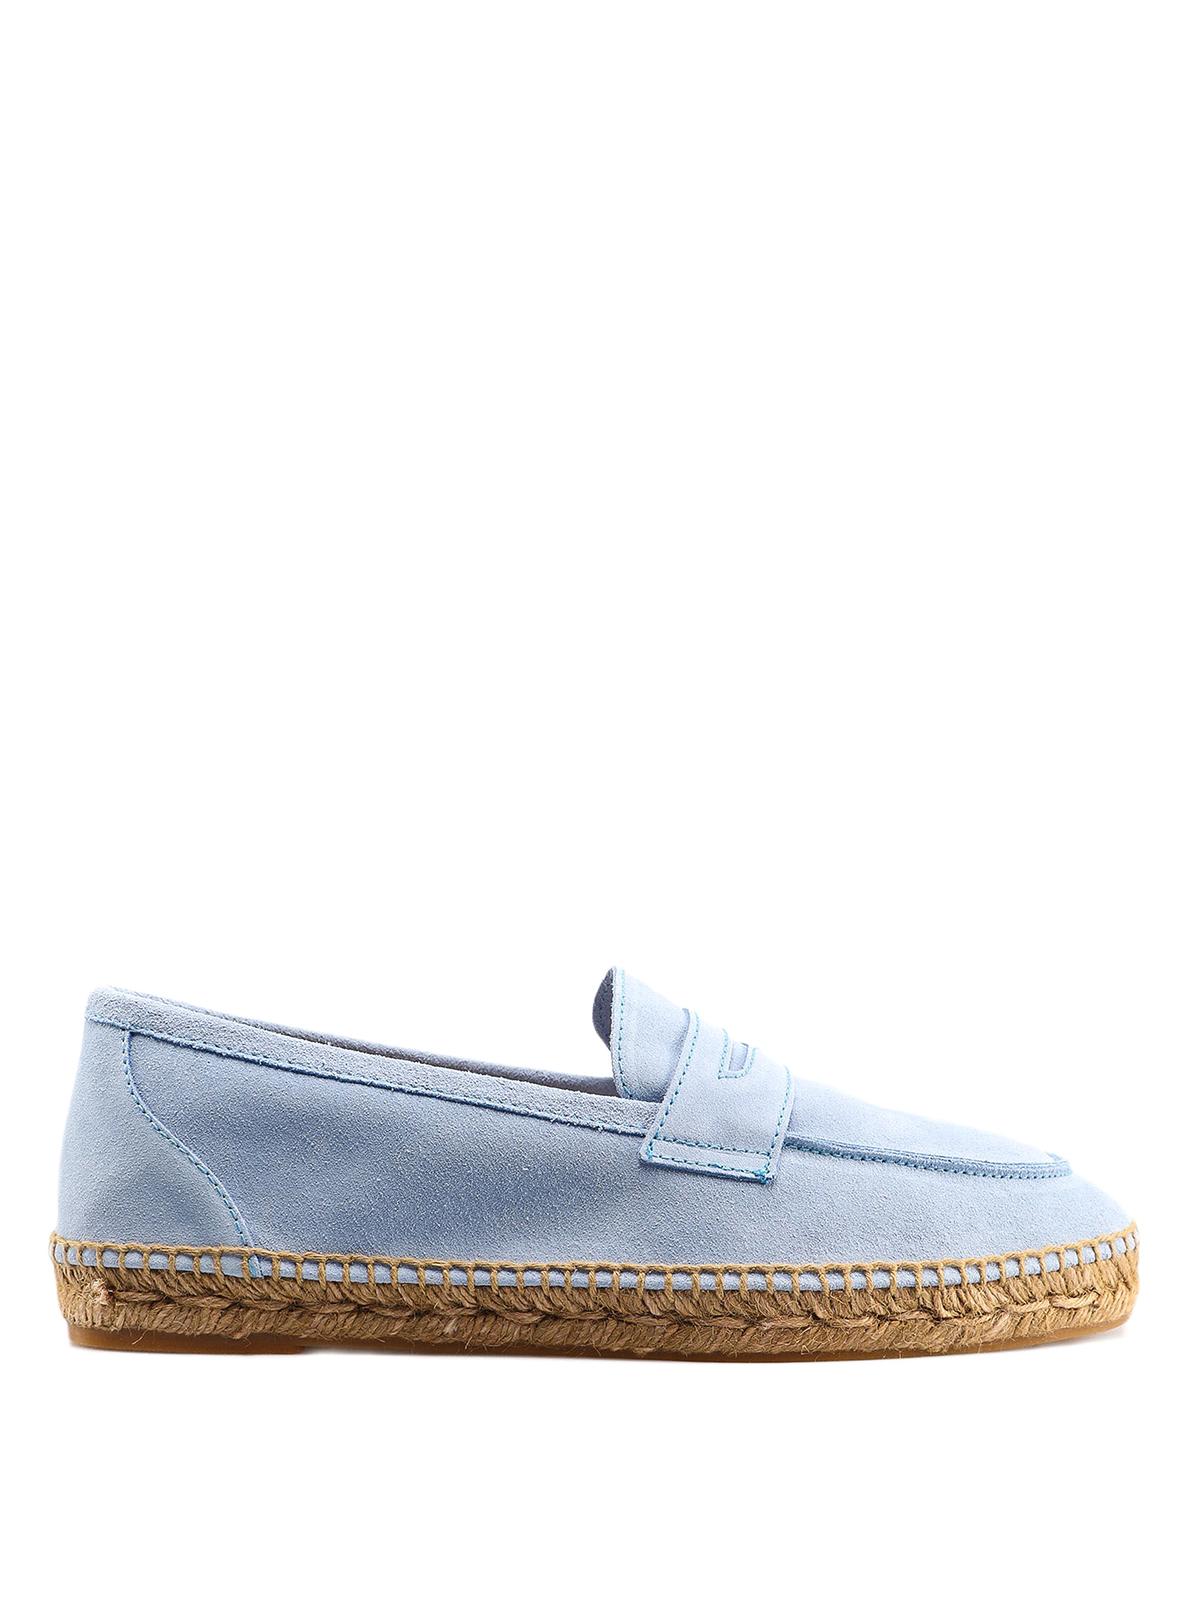 3079a1eec Castaner - Nacho light blue loafer espadrilles - Loafers & Slippers ...